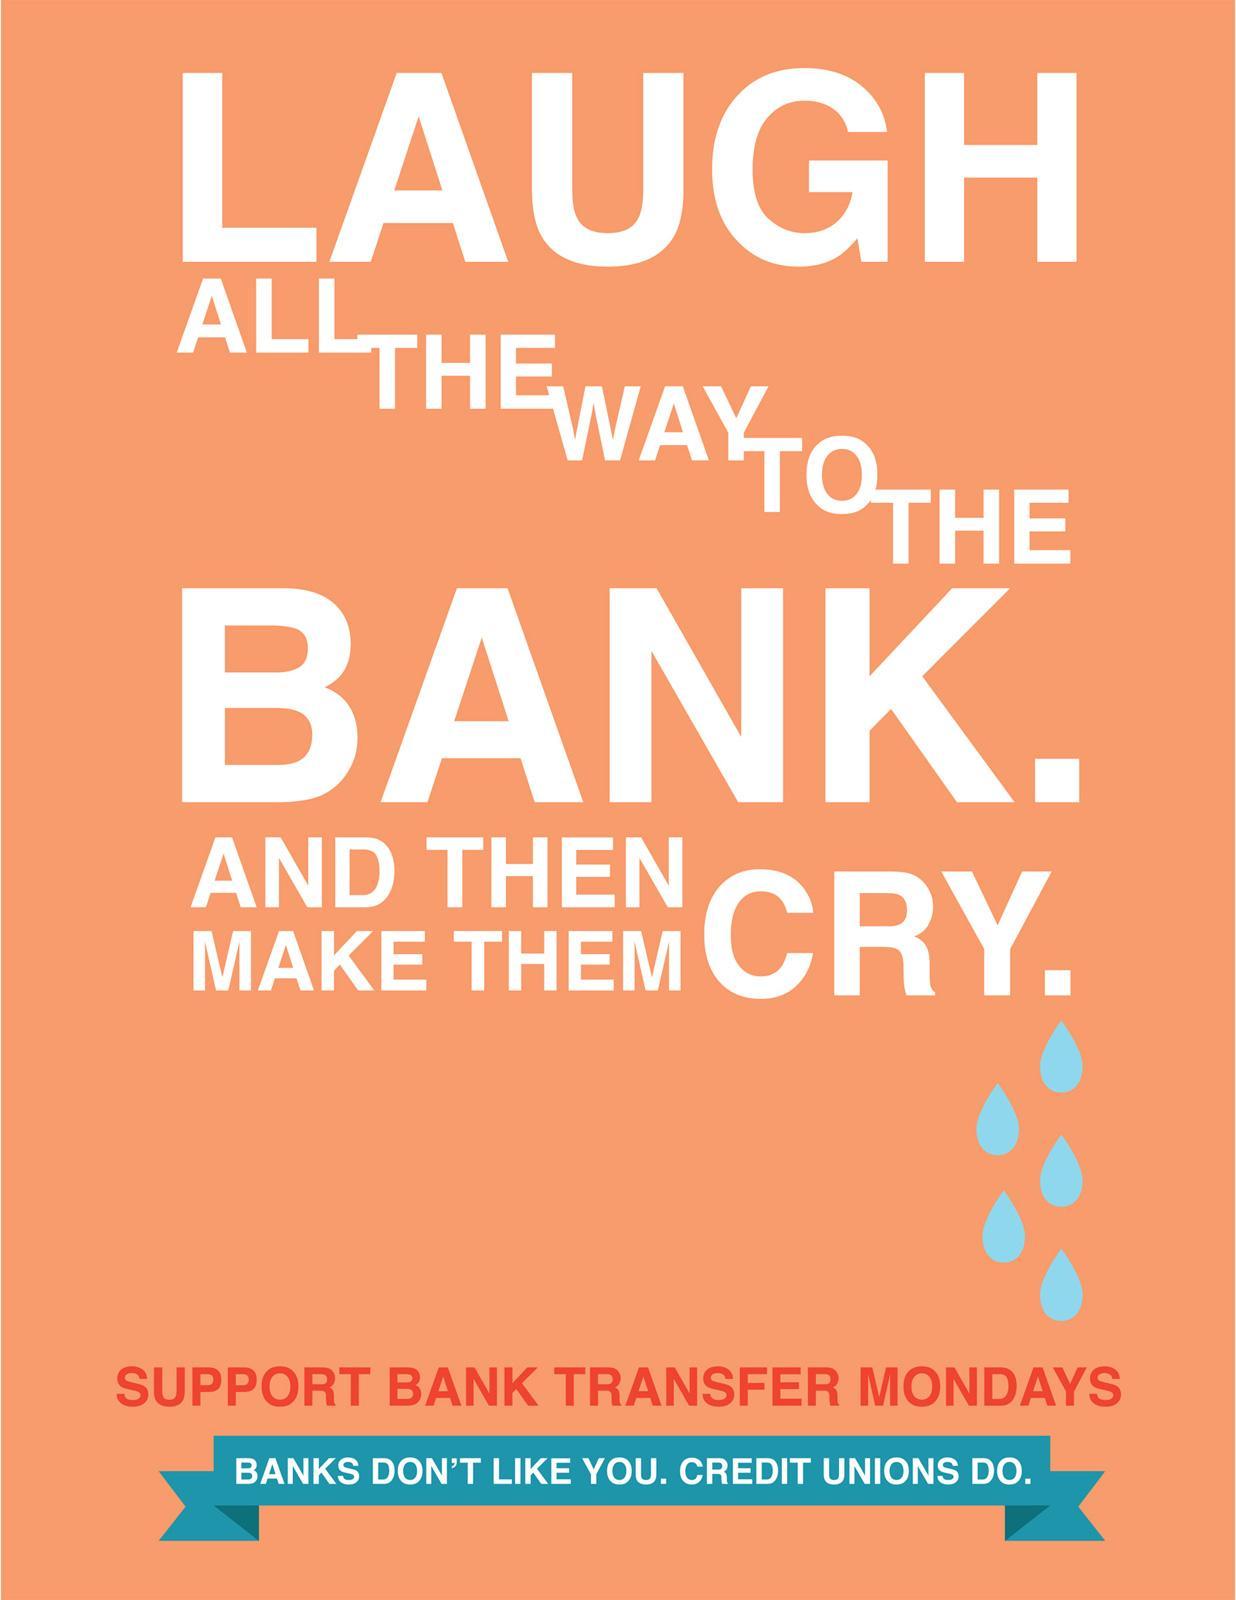 CO-OP Financial Services Print Ad -  Laugh